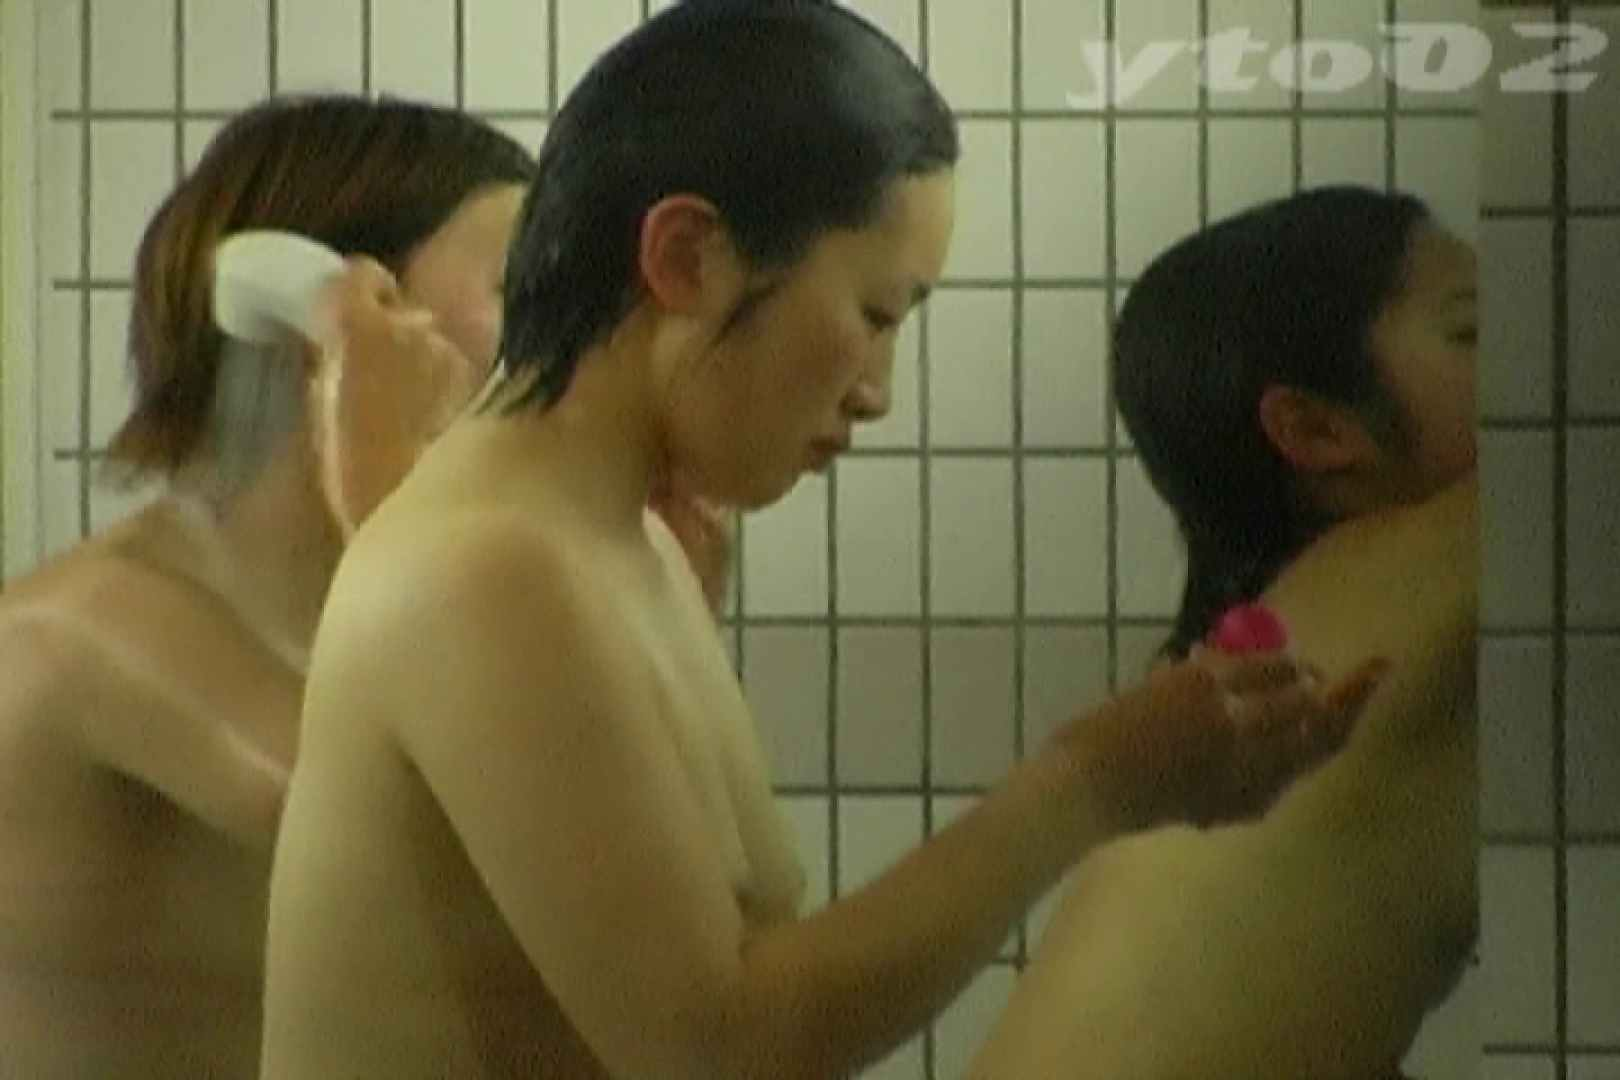 ▲復活限定▲合宿ホテル女風呂盗撮 Vol.11 入浴  79pic 64